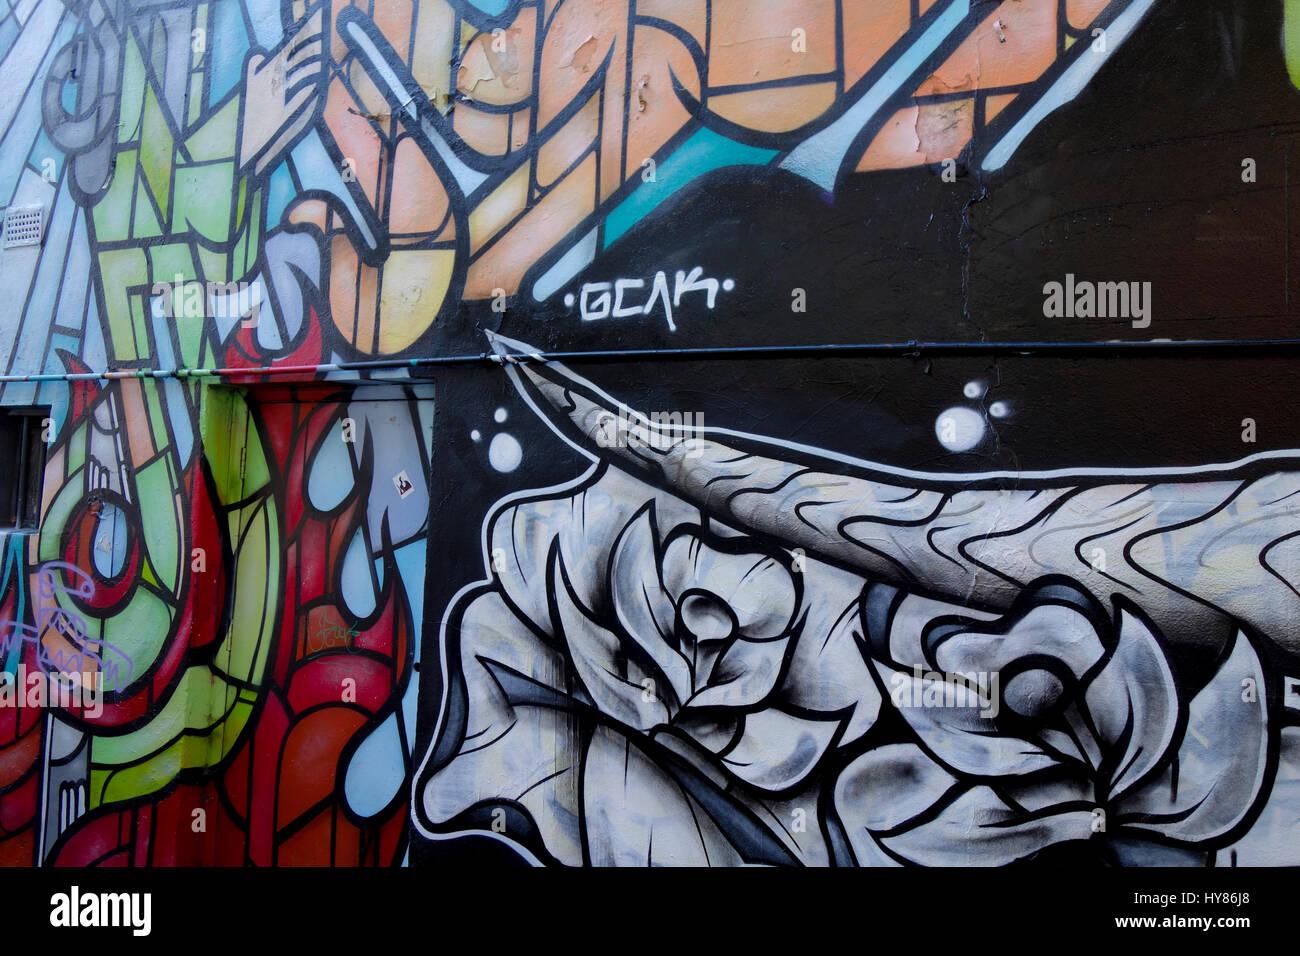 Graffiti and street art in brick lane east london uk